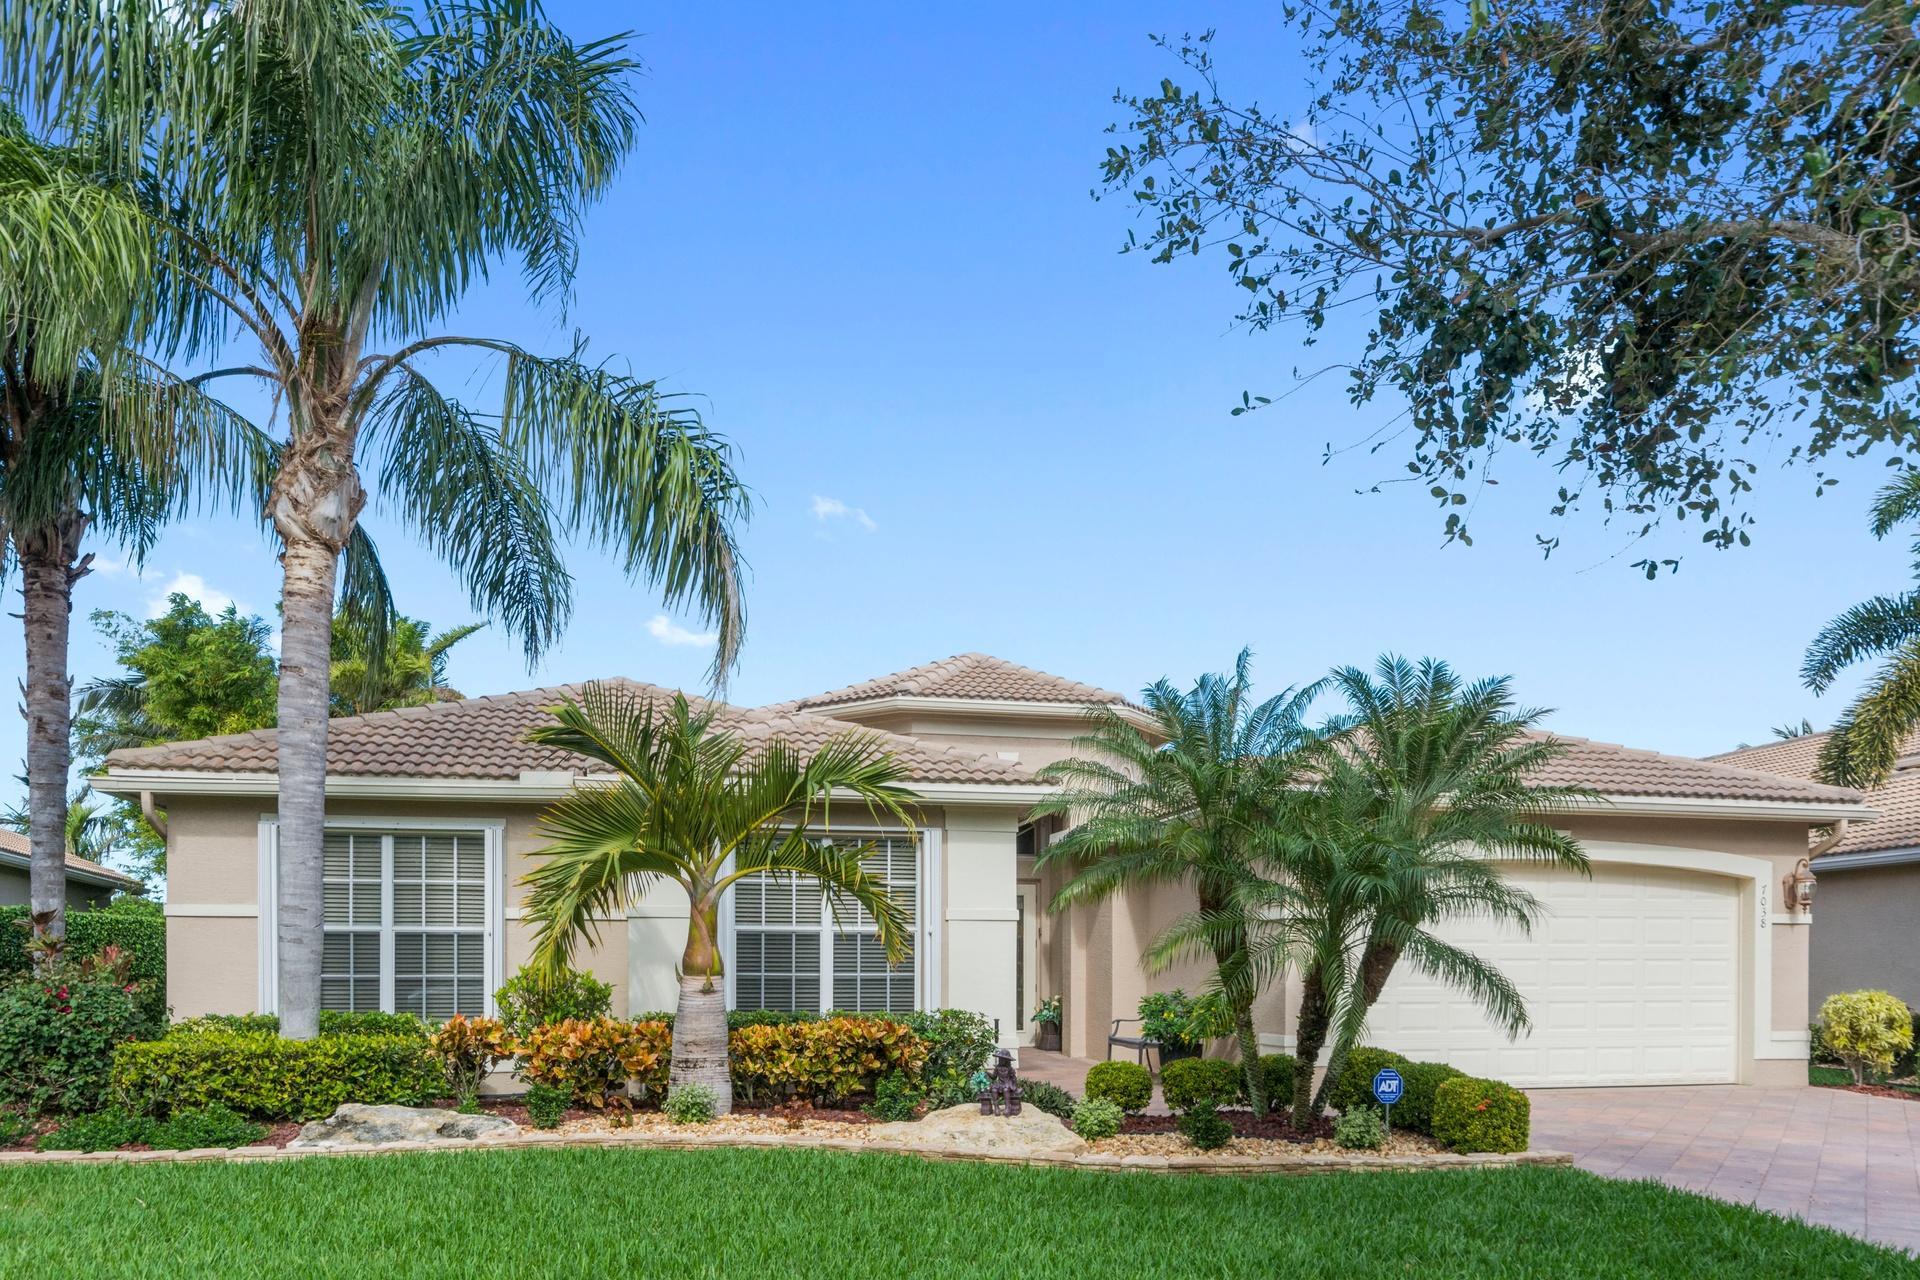 7038 Great Falls Circle Boynton Beach, FL 33437